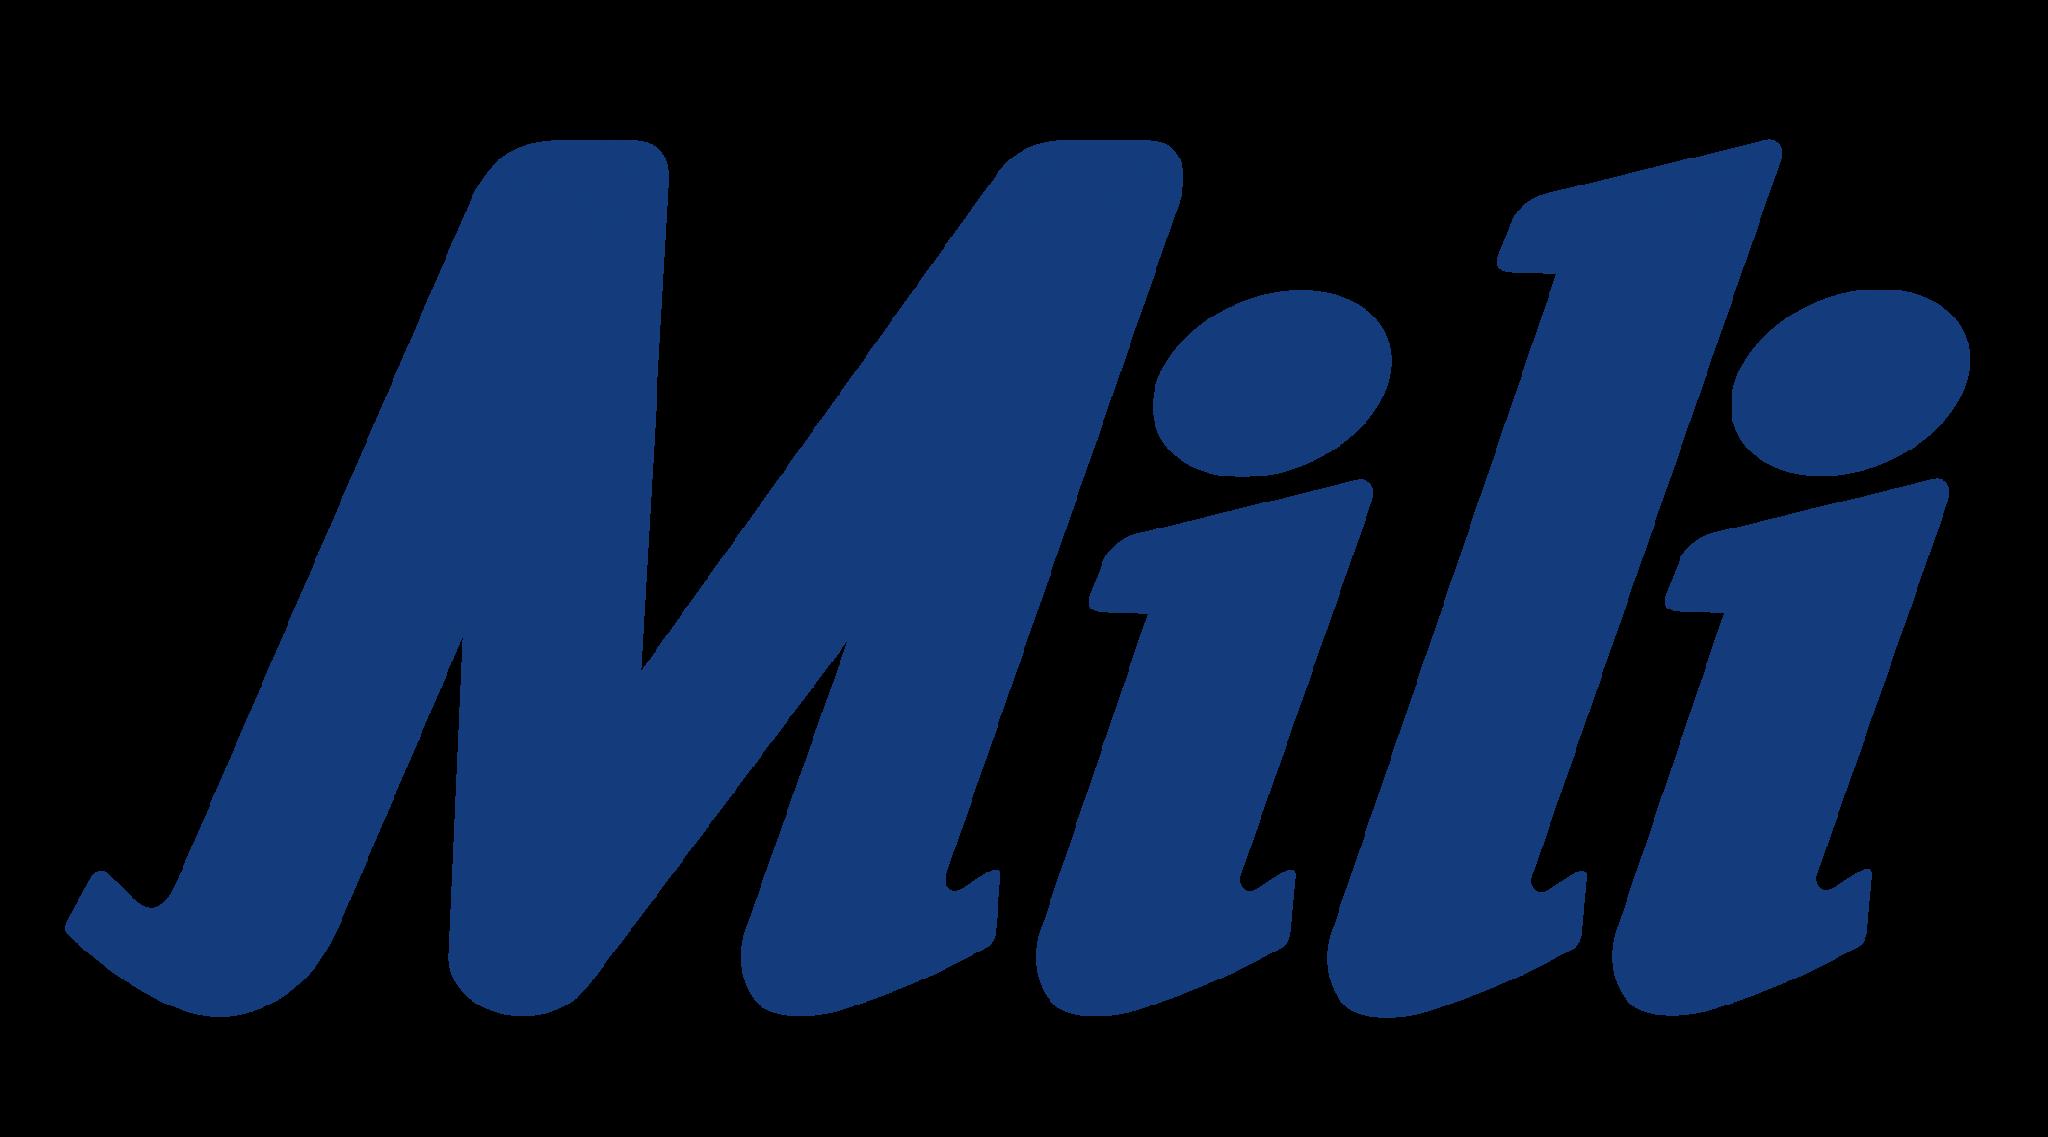 logo Mili - Azul